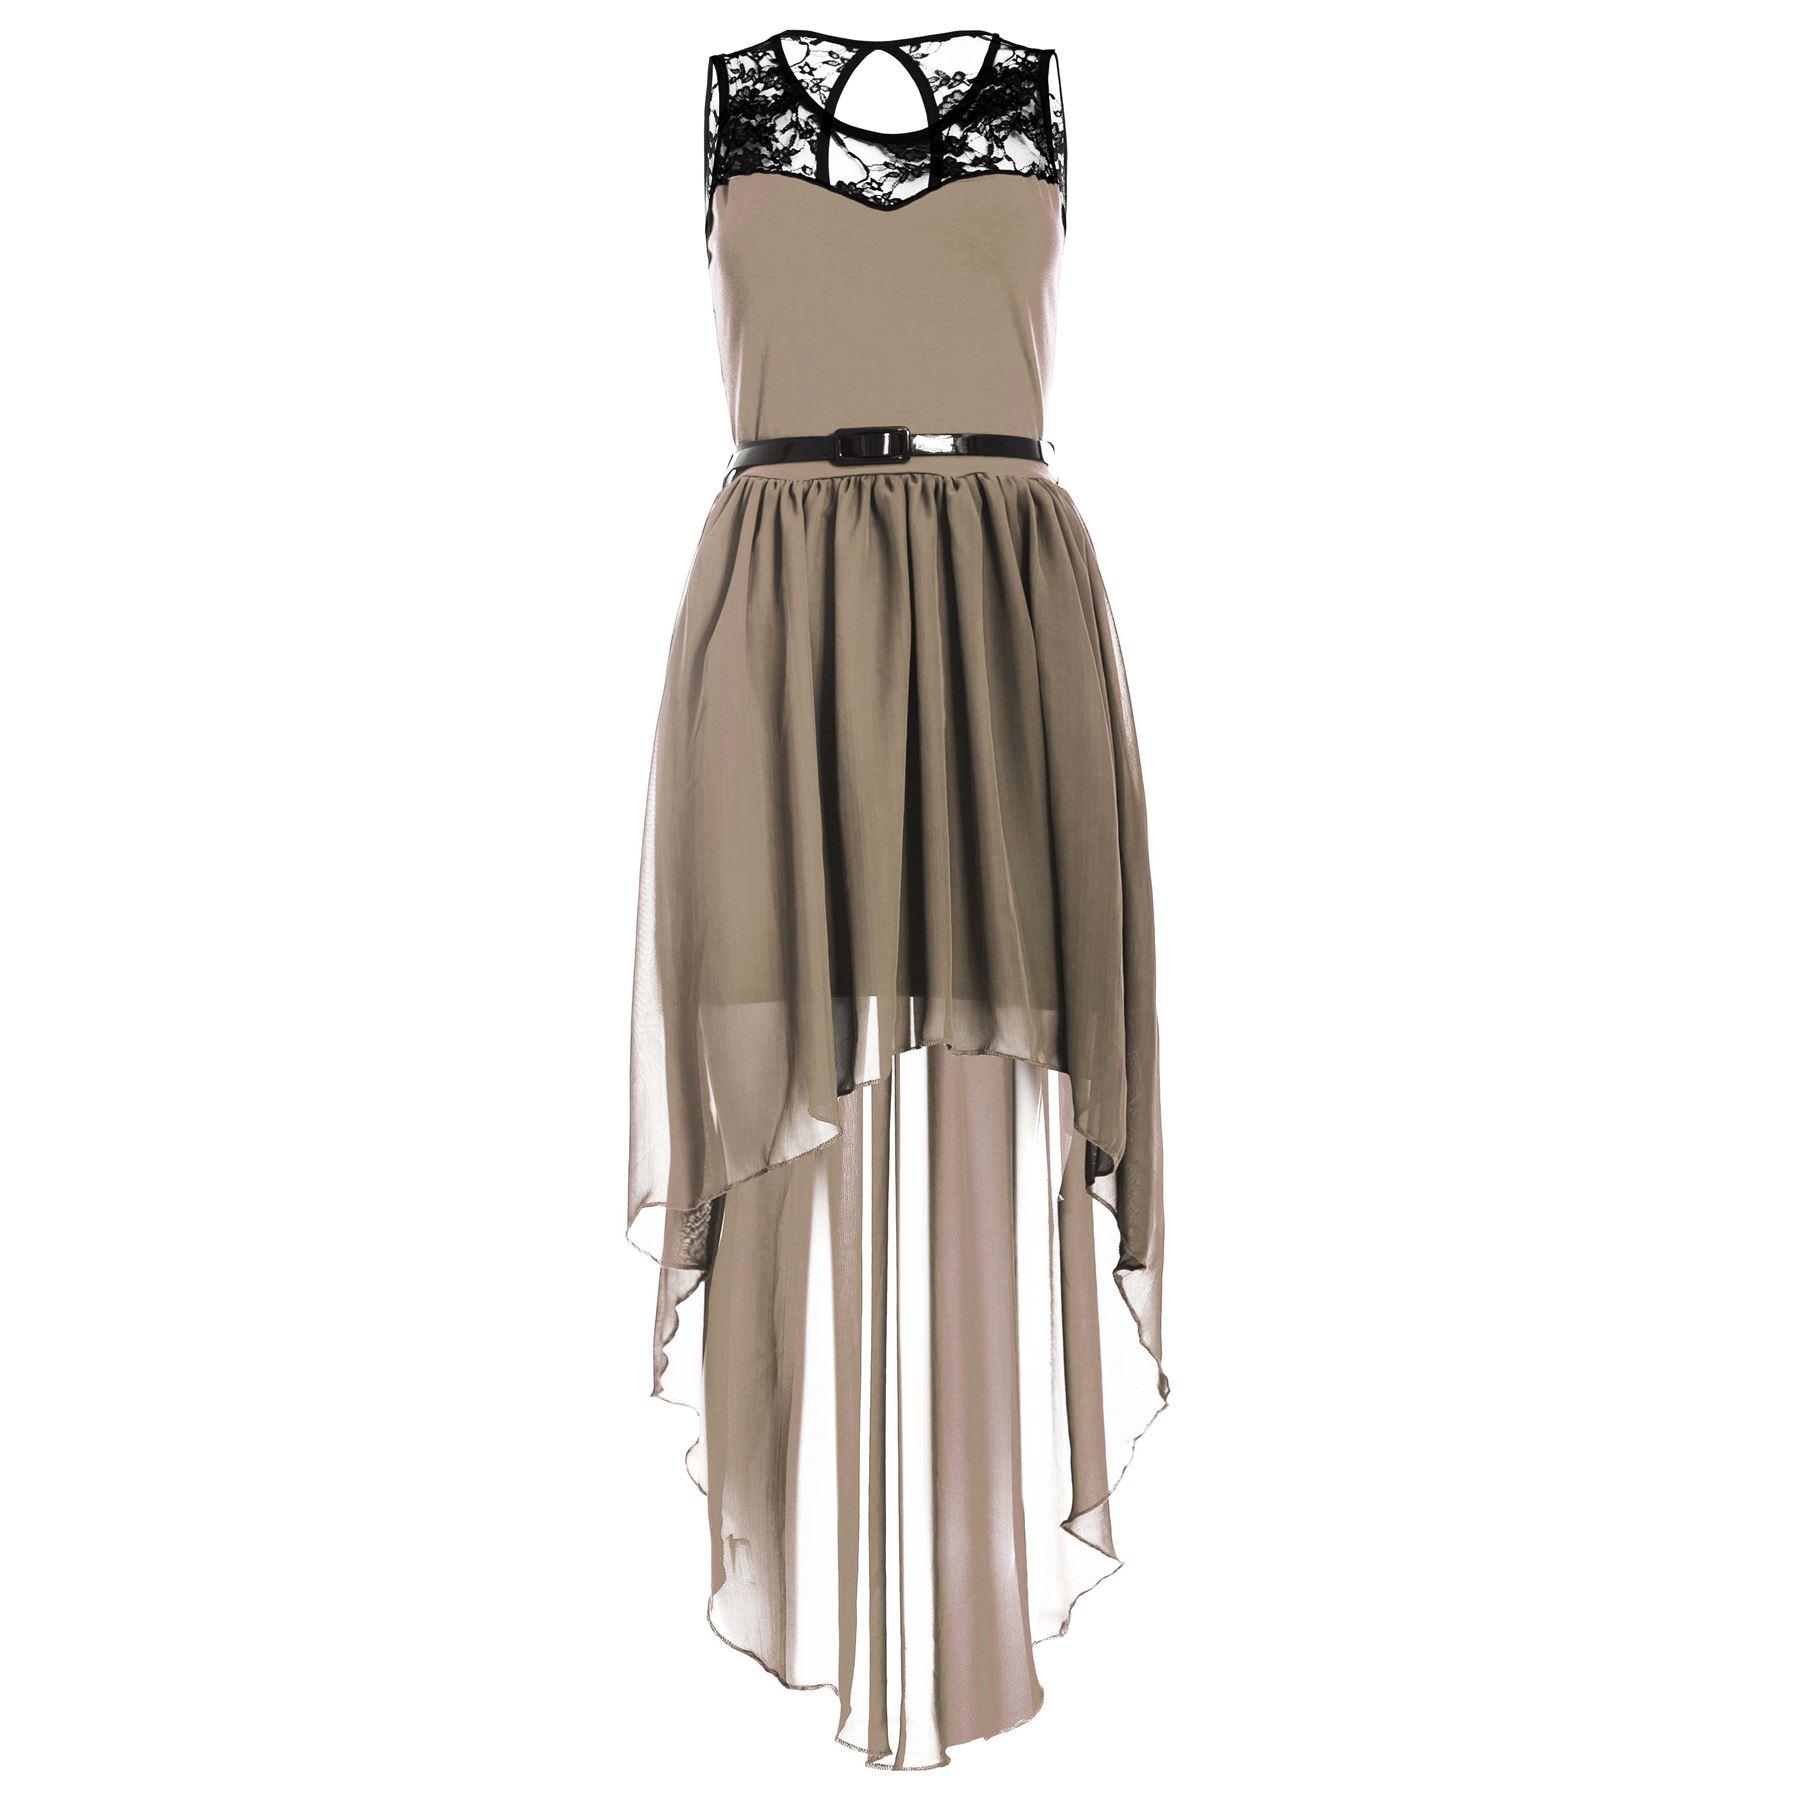 Womens-Lace-Chiffon-Ladies-High-Low-Dip-Hem-Assymetric-Belted-Mixi-Midi-Dress